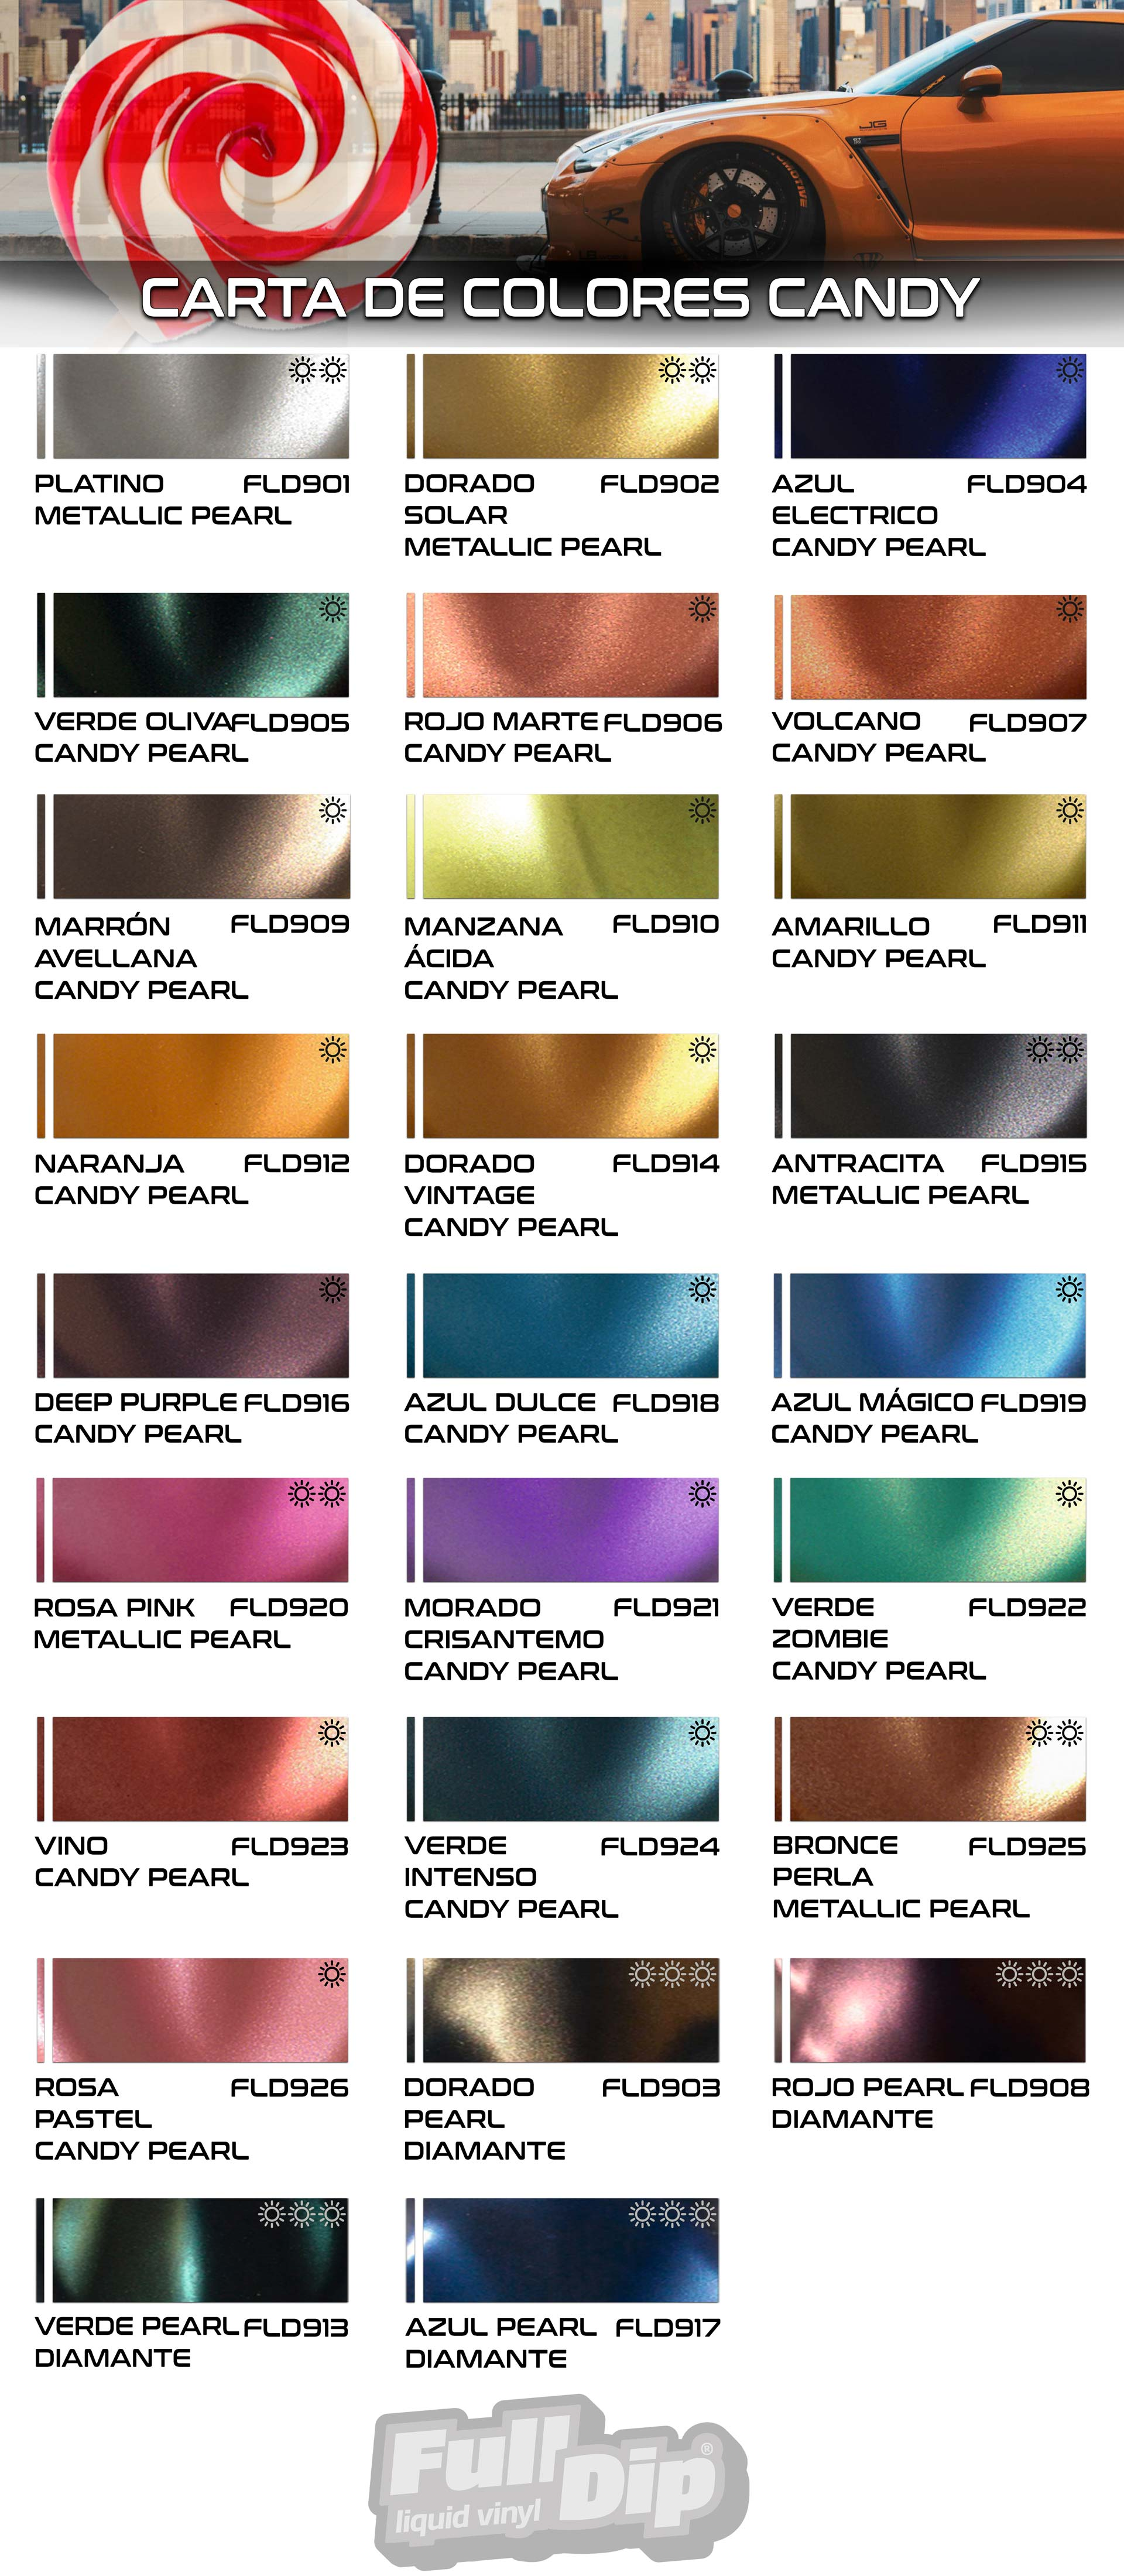 CARTA-COLORES-CANDY-FULLDIP-WEB-2020_1.j